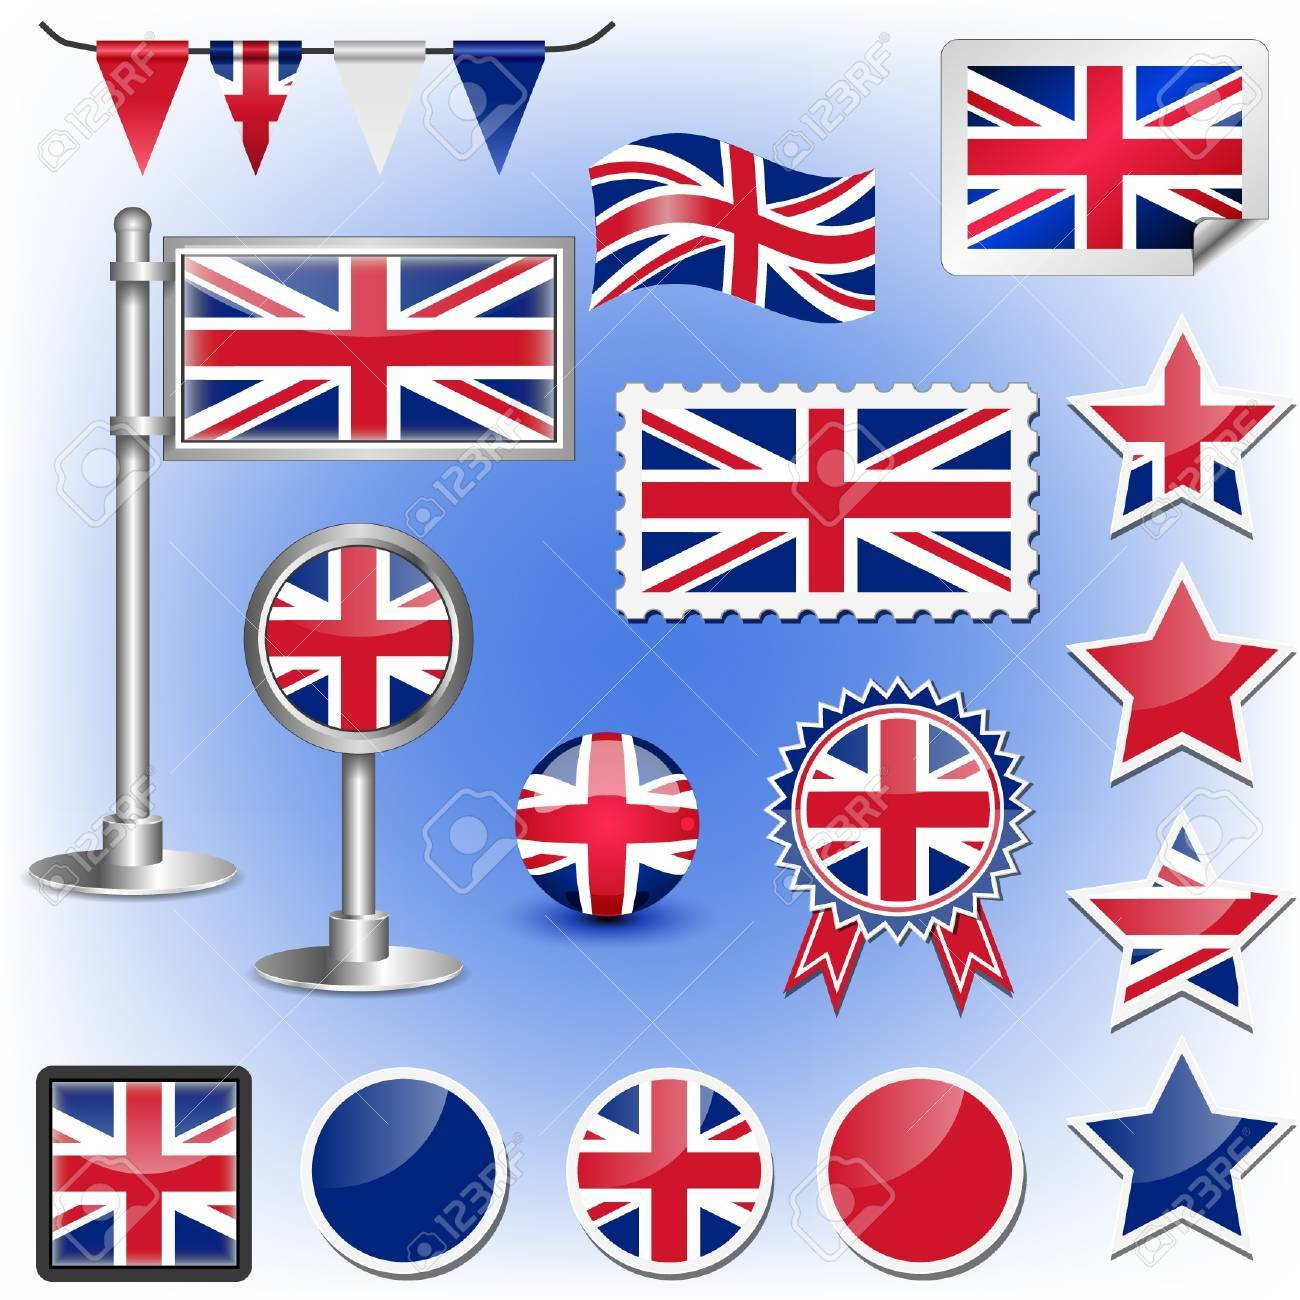 british flag Stock Vector - 11660023